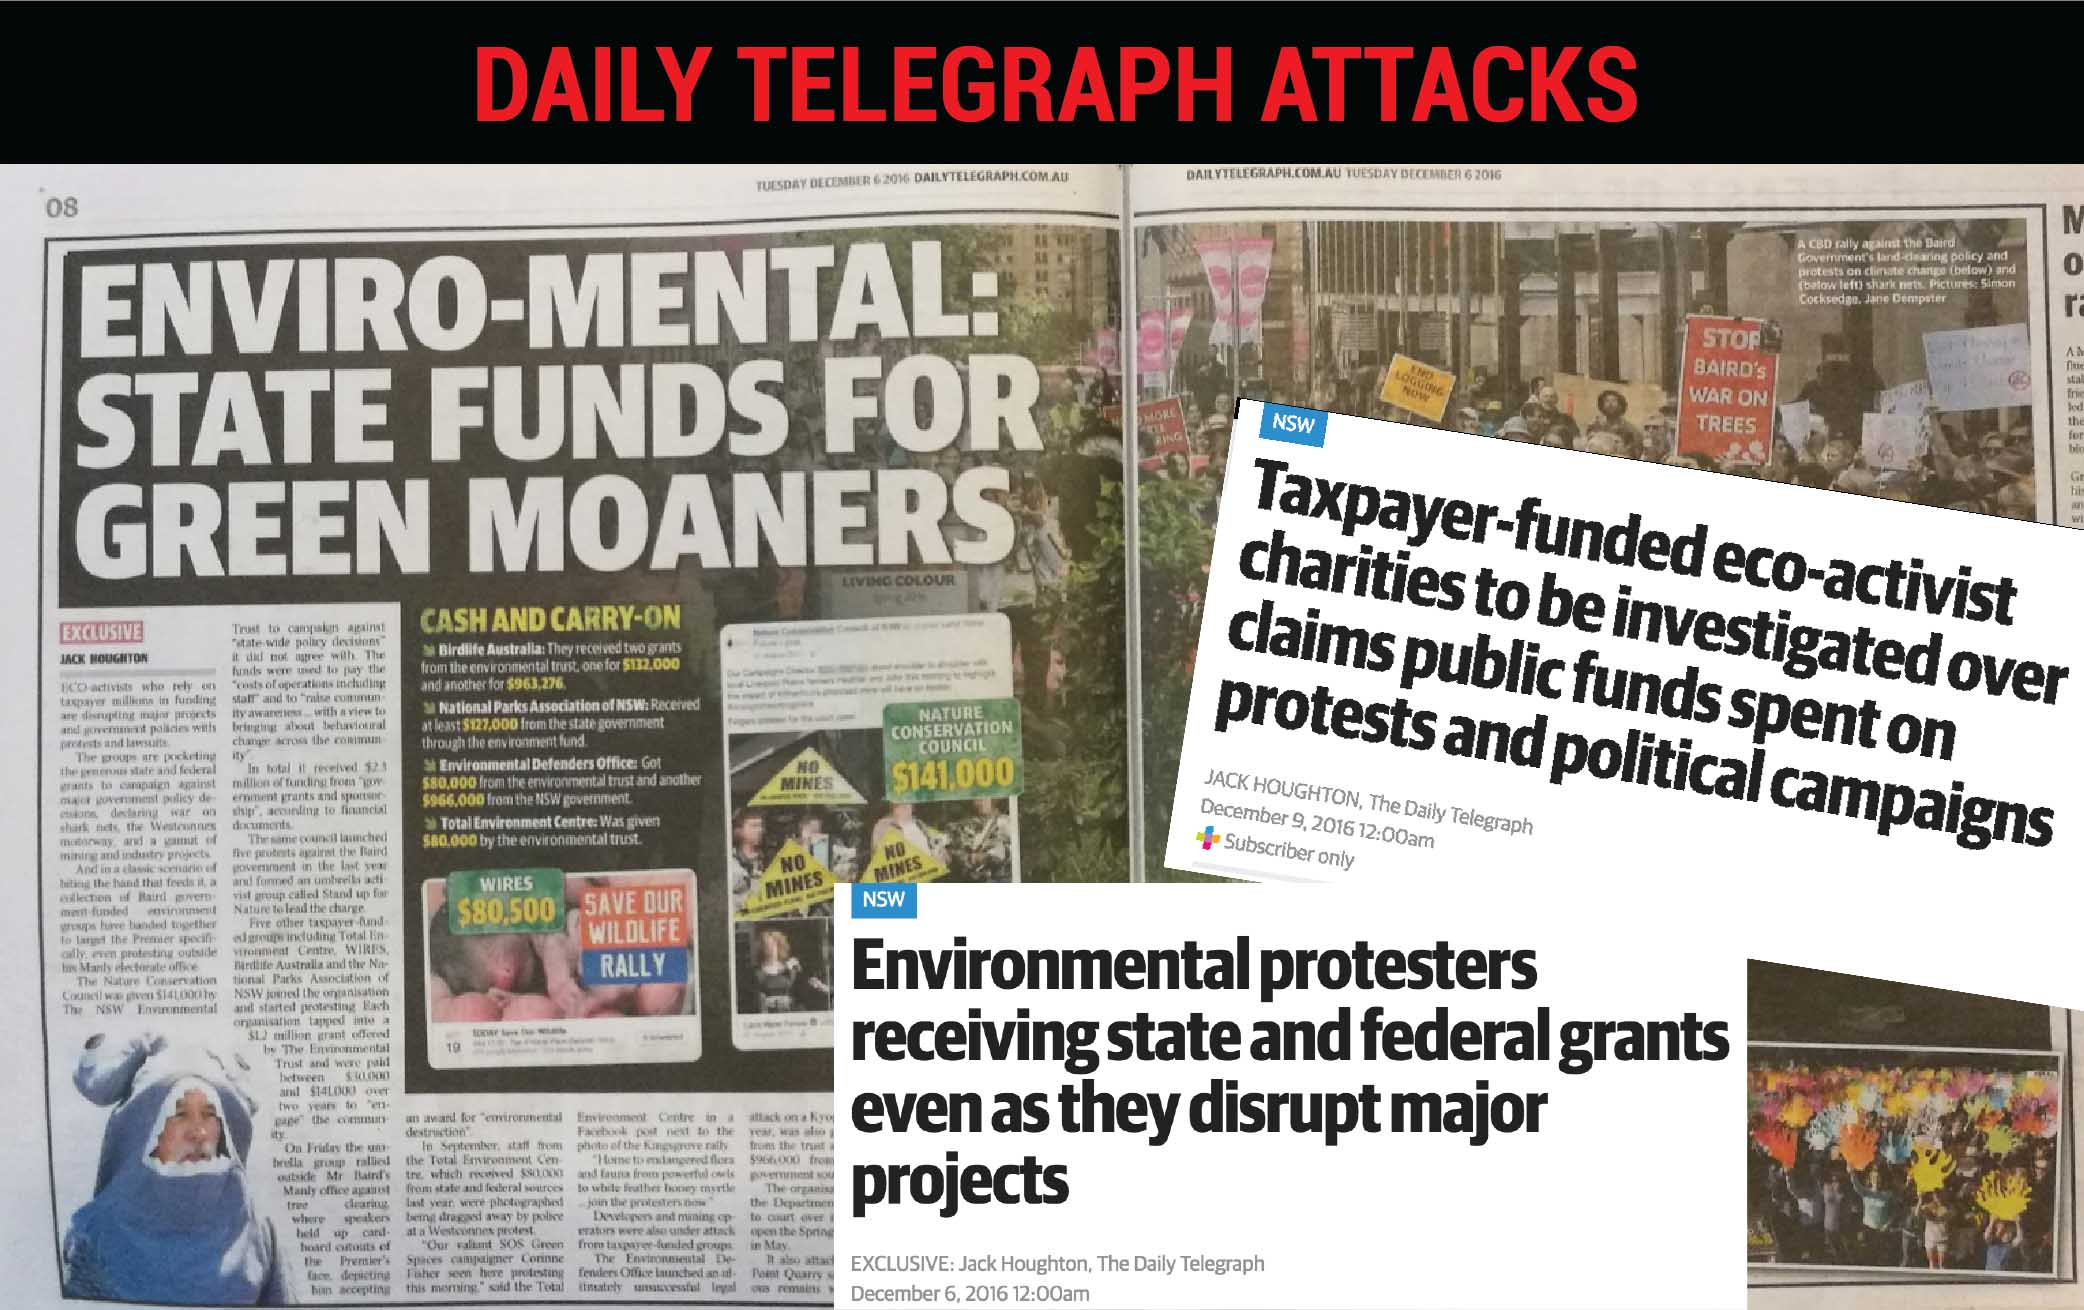 161214_daily_telegraph_articles-01_copy.jpg